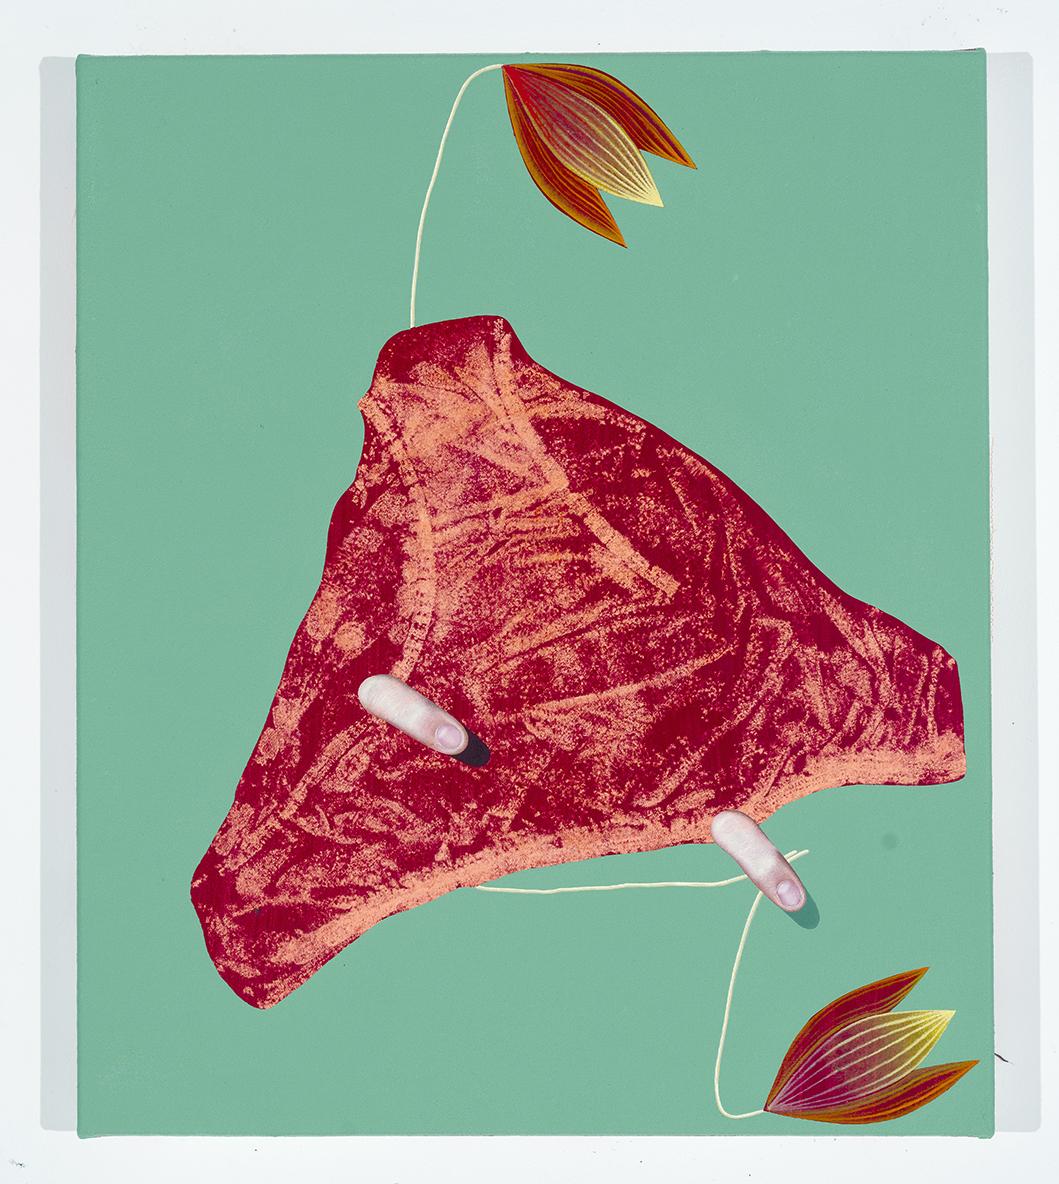 Canadian Art | Veronika Pausova Paints a Spidery Sublime